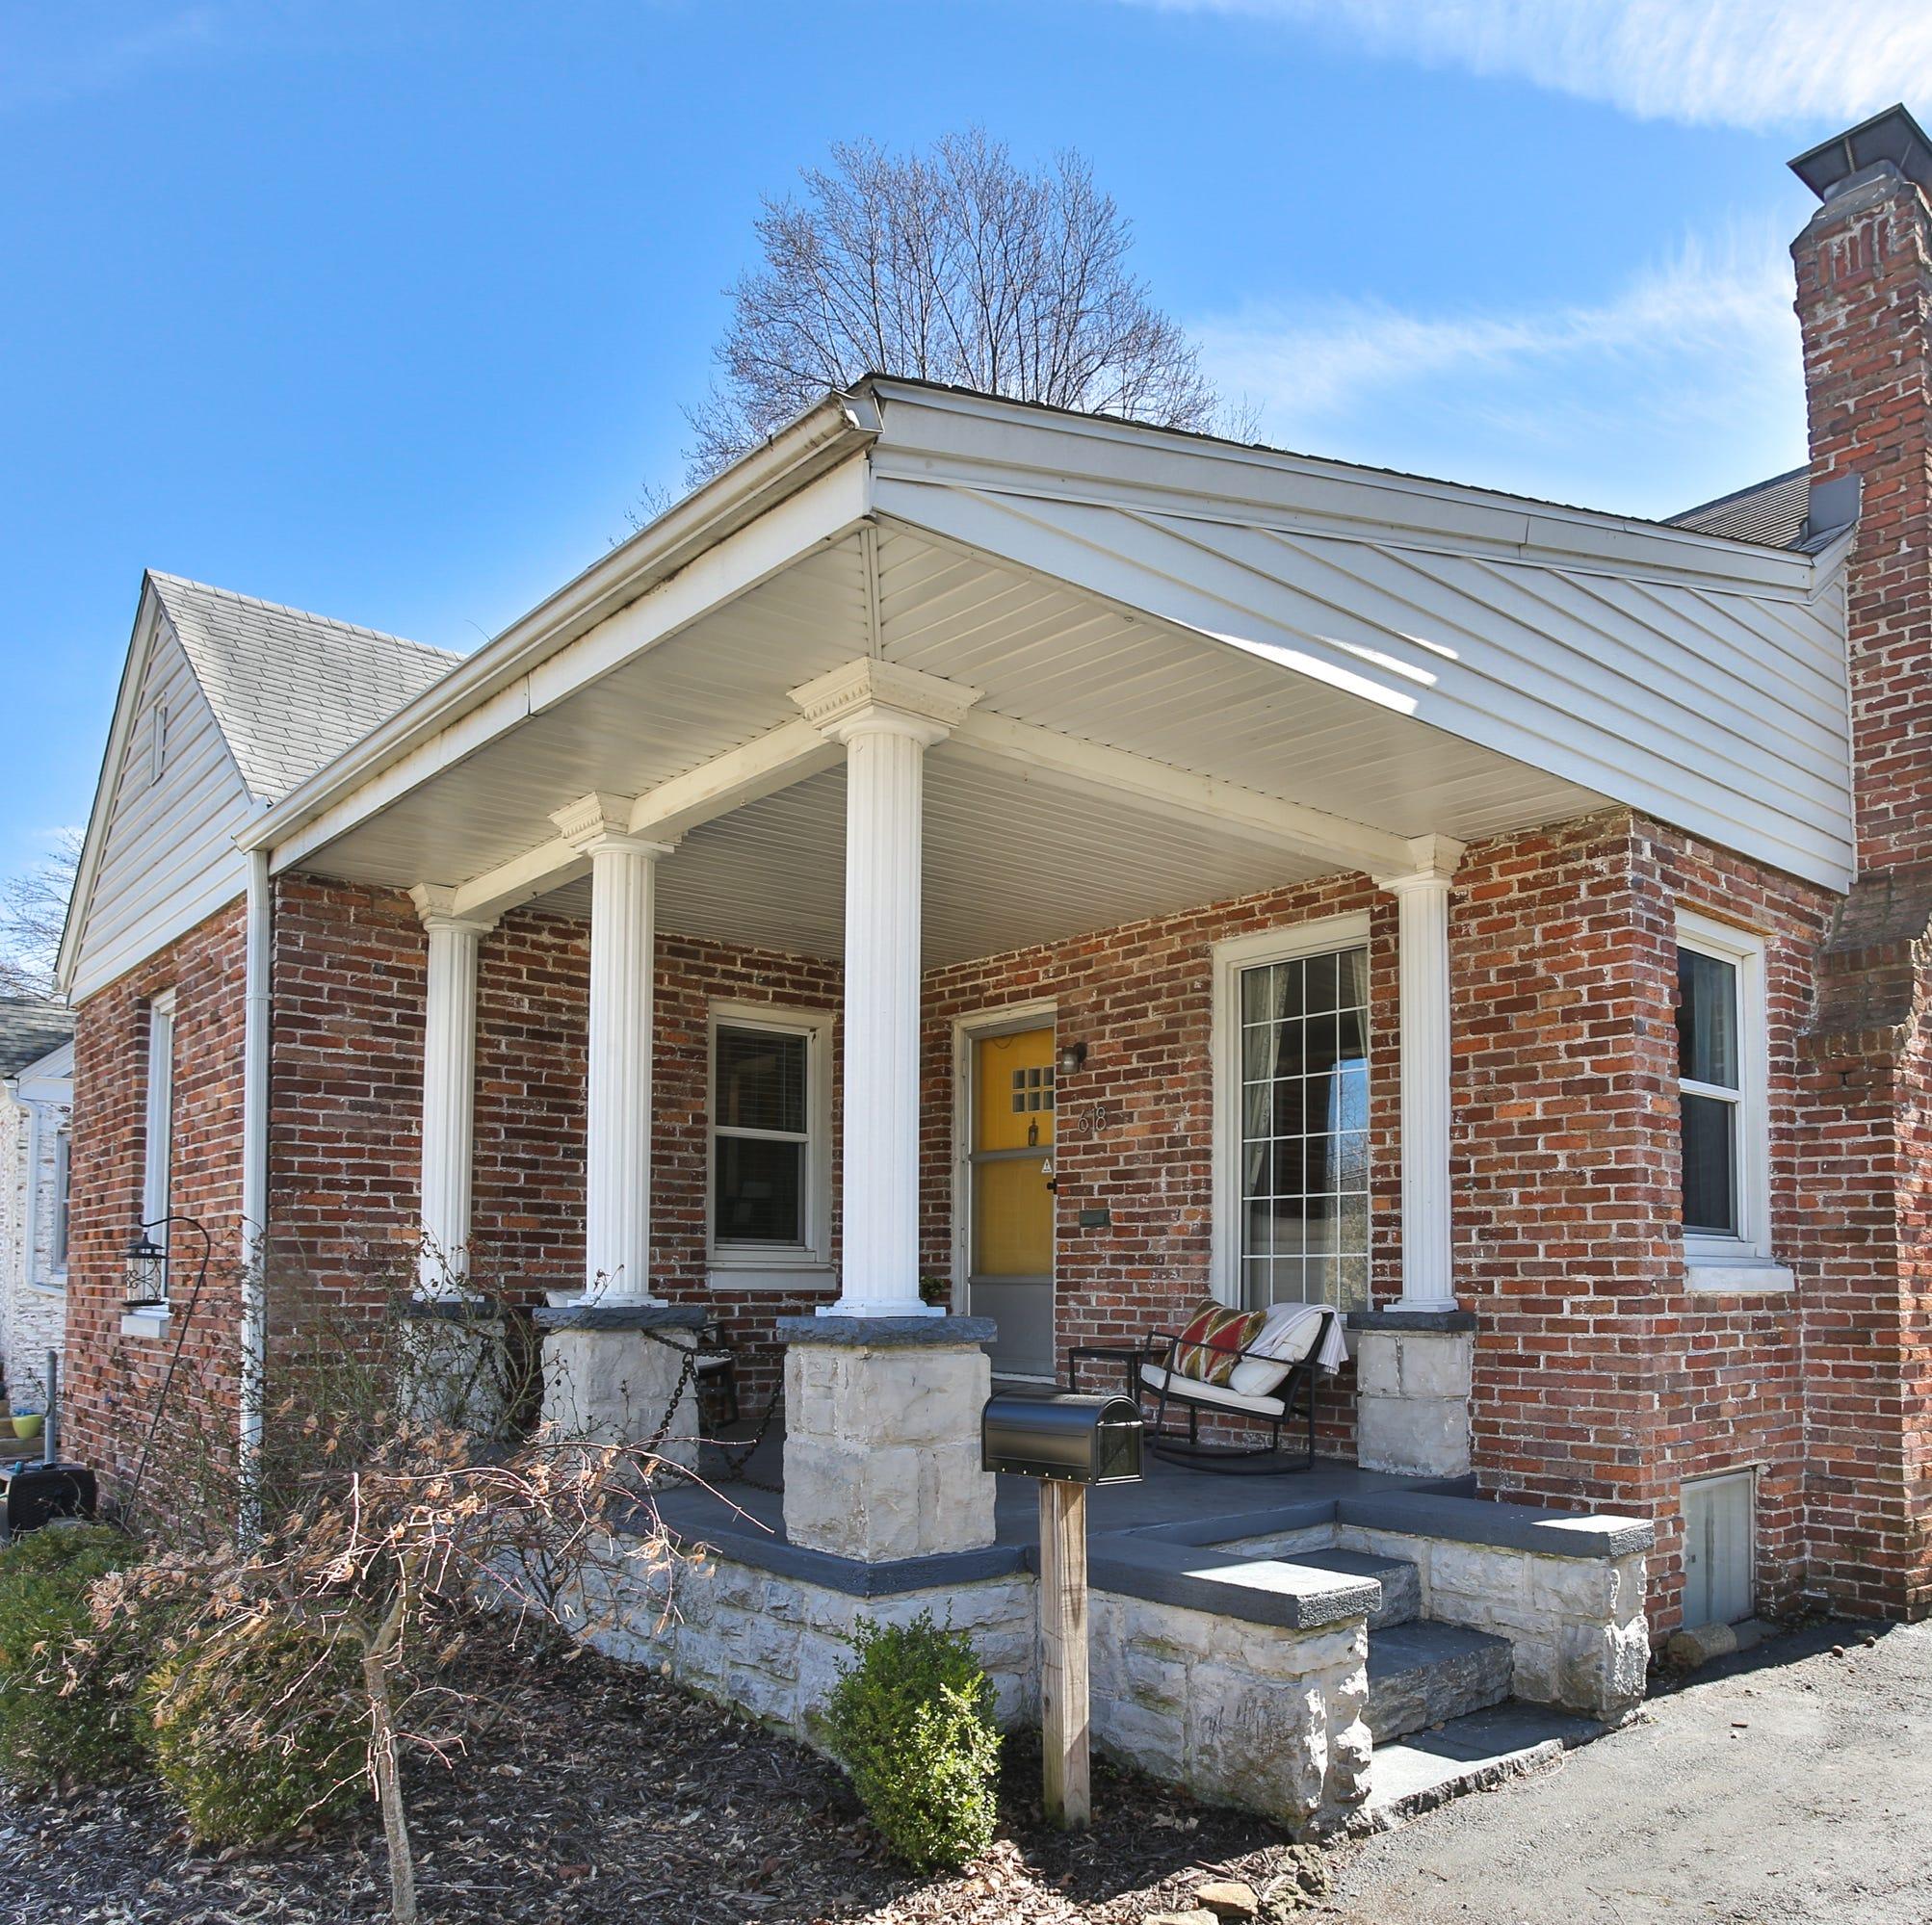 University Heights bungalow blends historic, modern elements